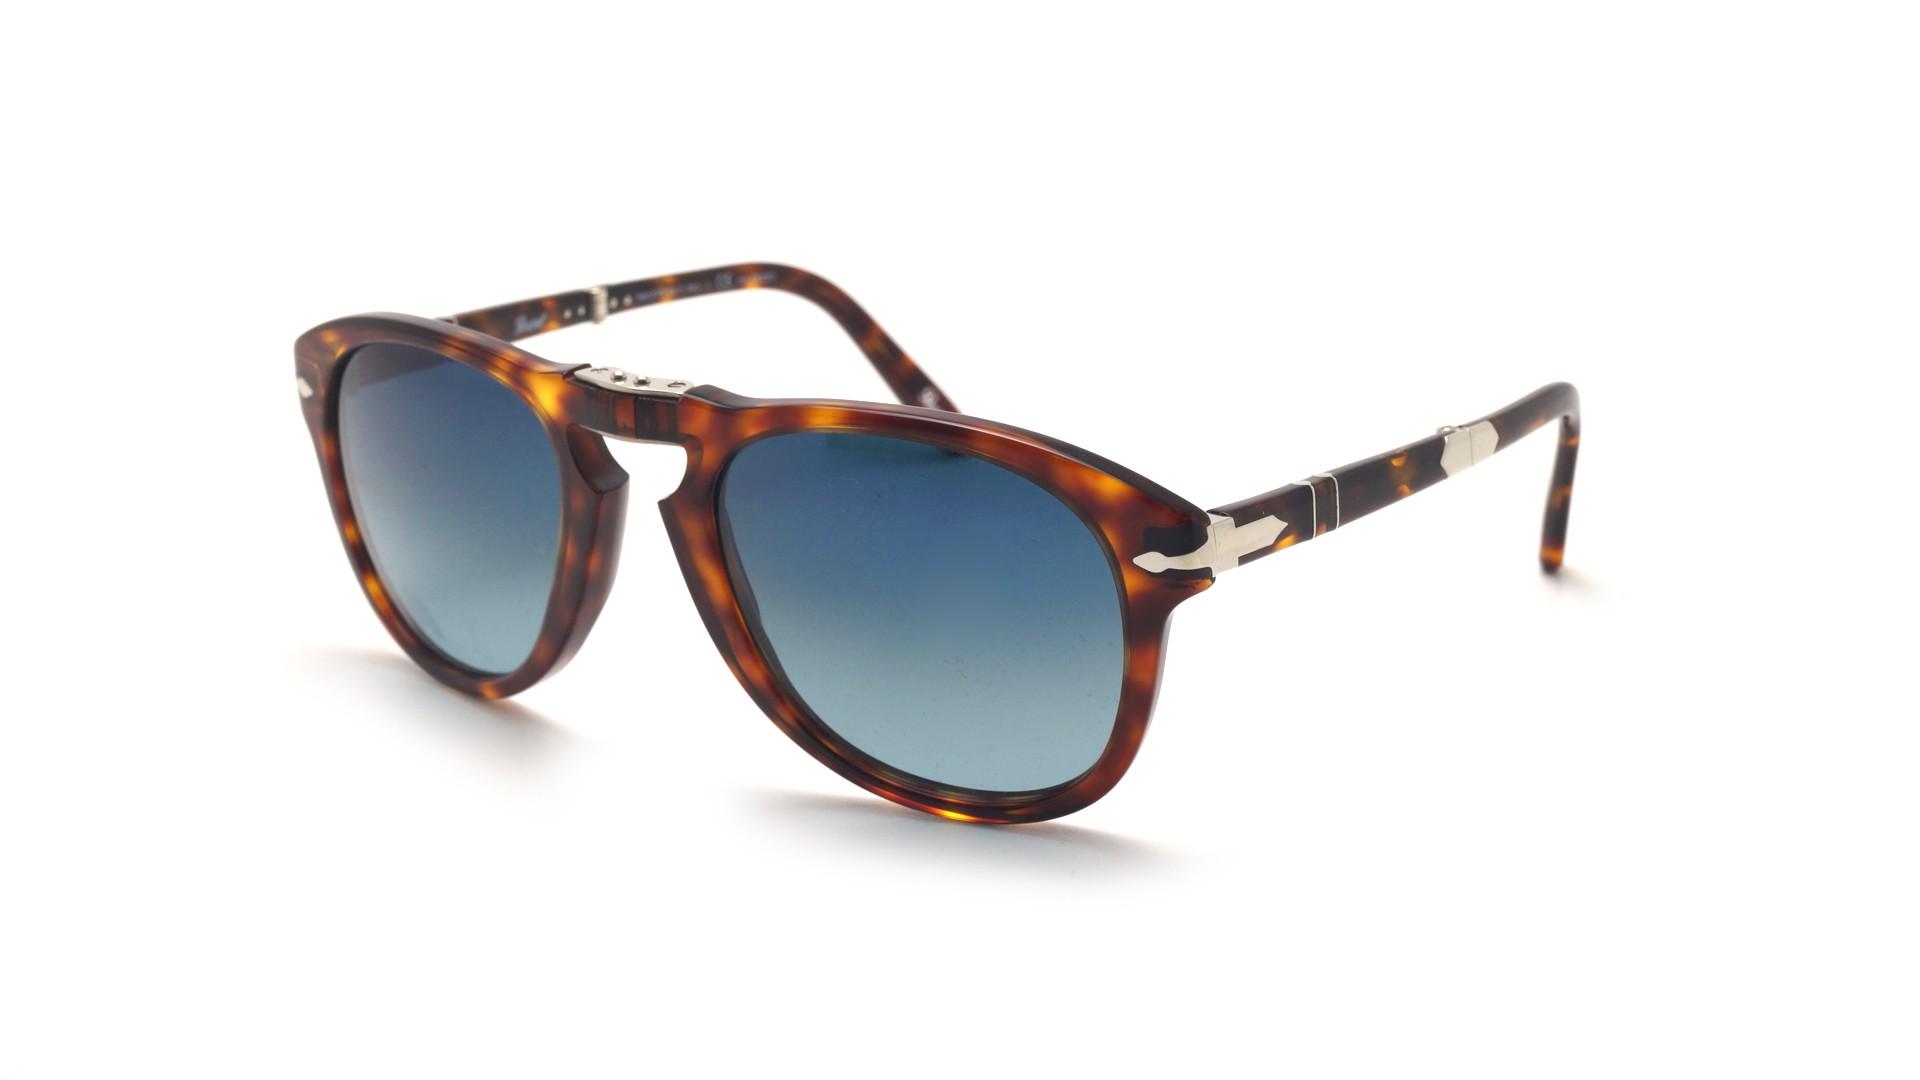 660c869362901 Sunglasses Persol Steve Mcqueen Tortoise PO0714SM 24 S3 54-21 Large Folding  Polarized Gradient